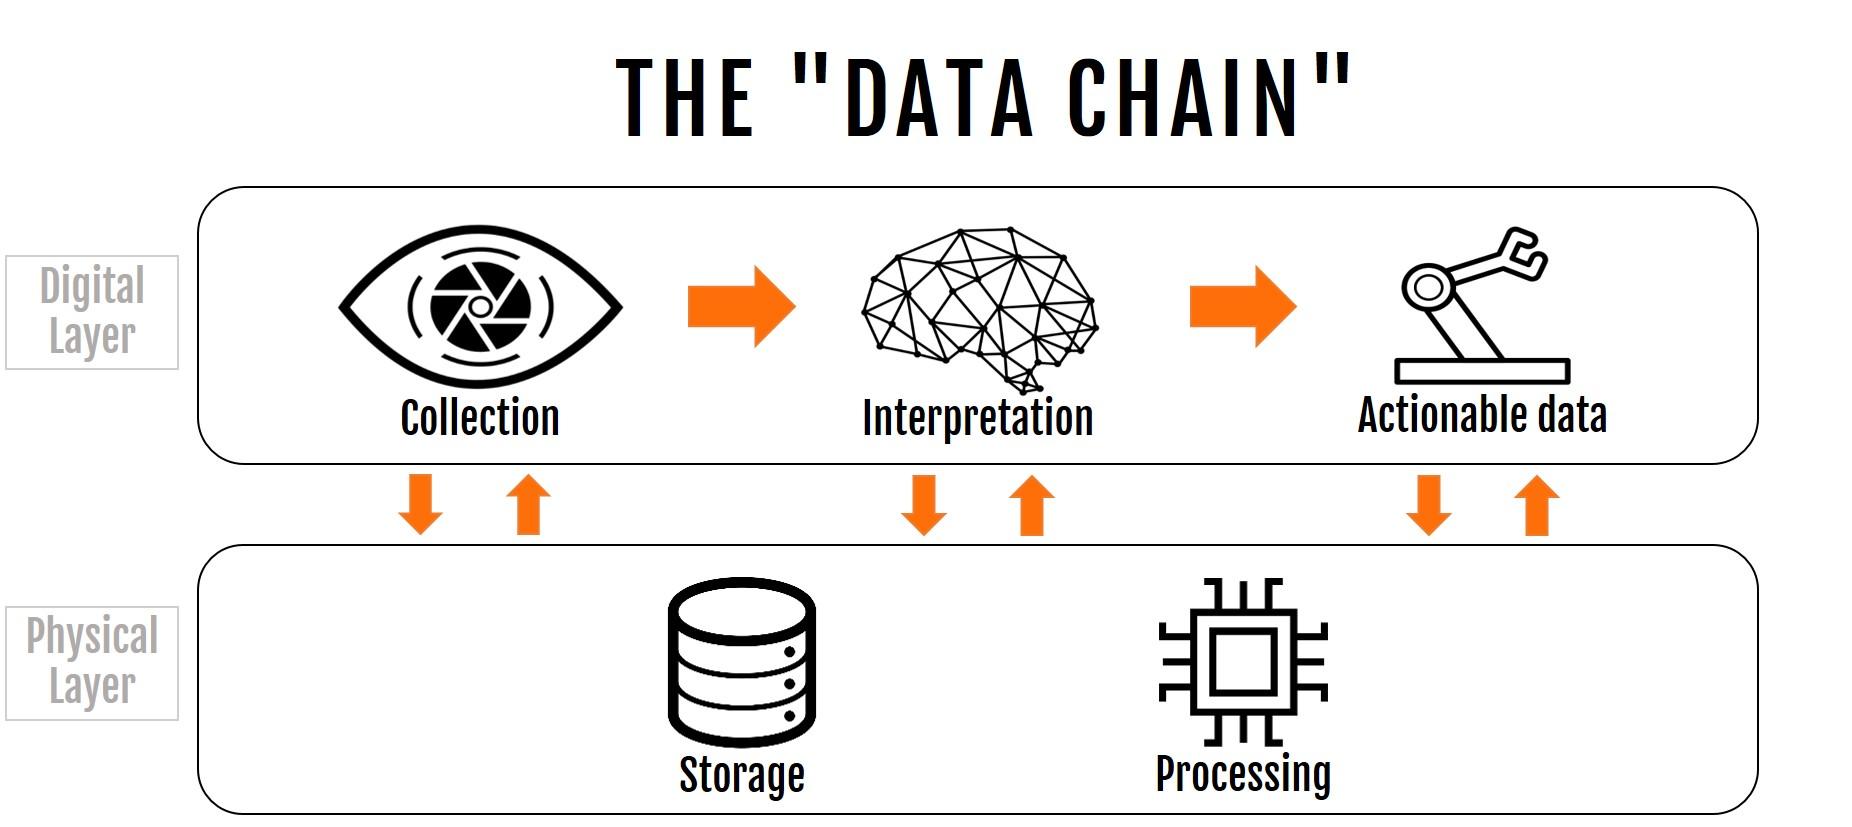 2-the-data-chain-3_no-logo